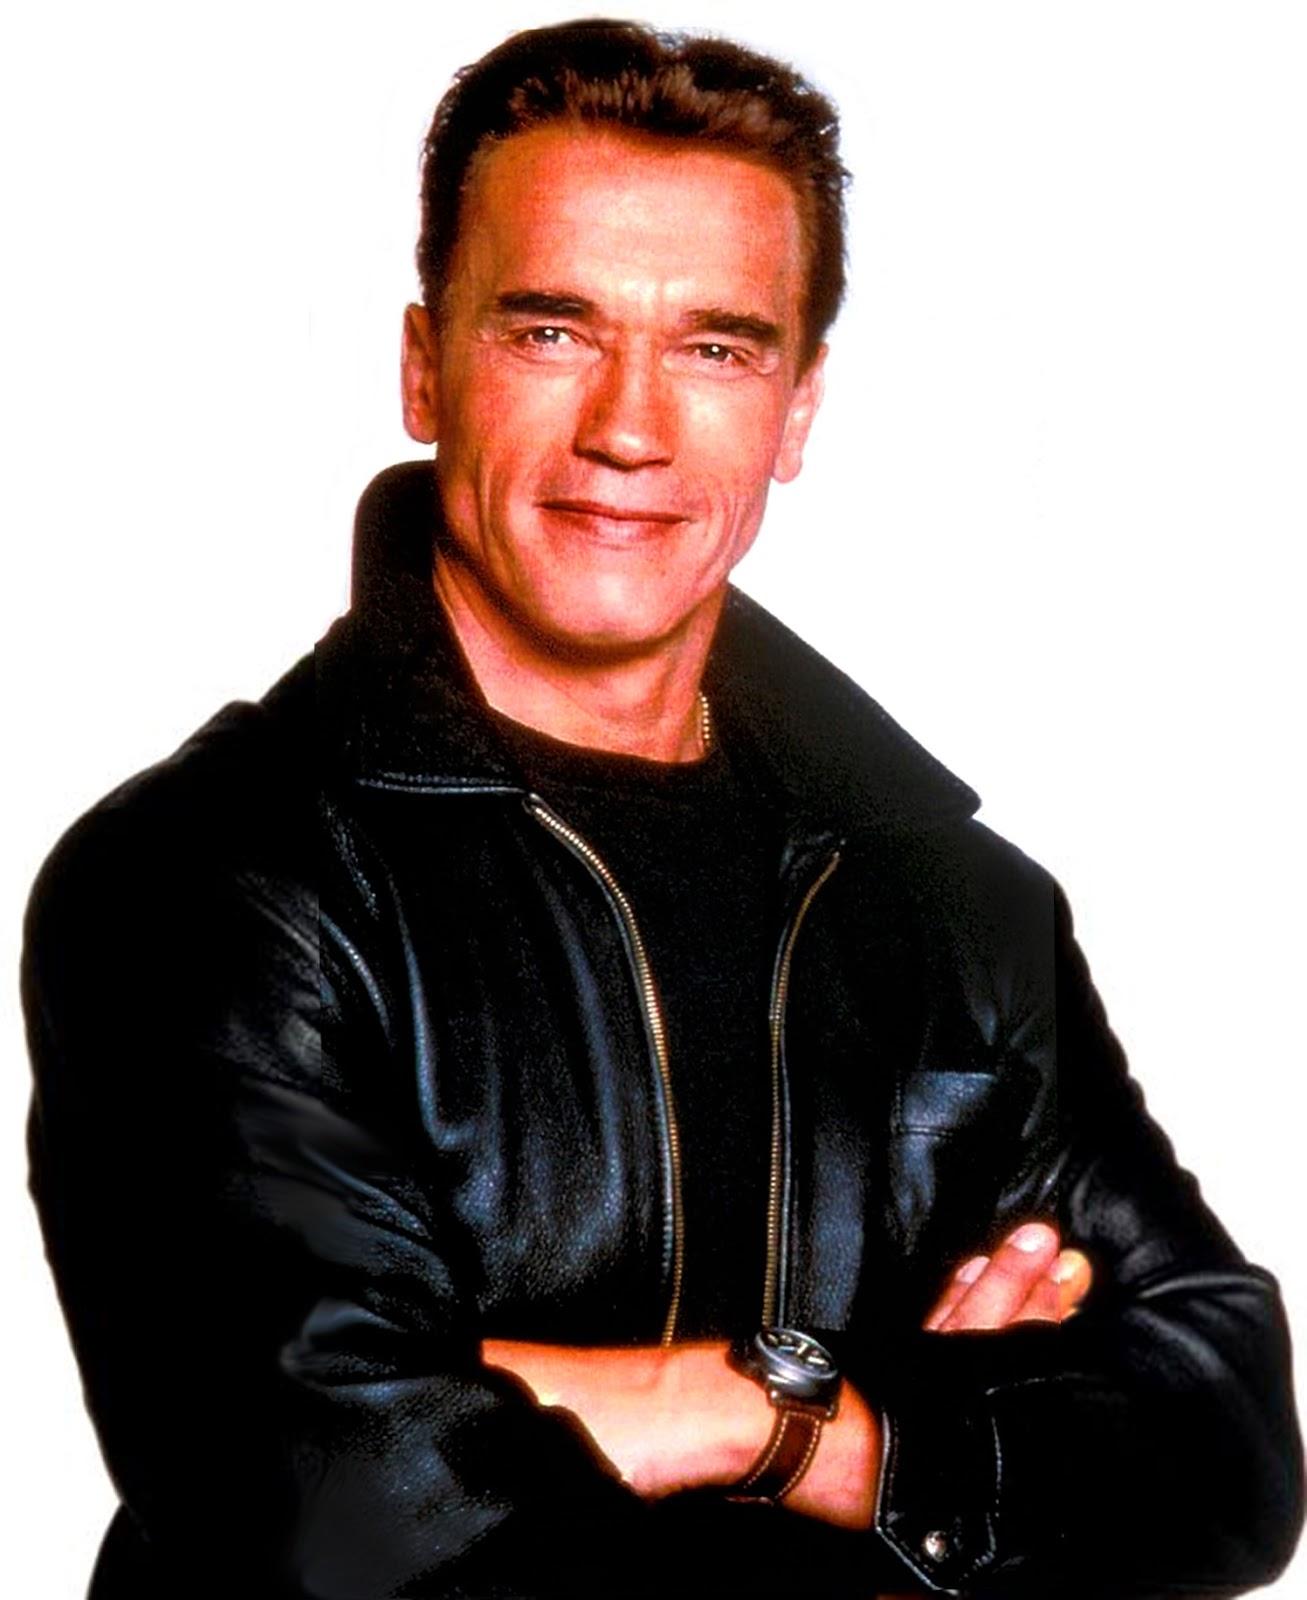 http://2.bp.blogspot.com/-9Y2Lf33Q9pE/UU_2BVEzTNI/AAAAAAAAXOQ/EuAz5wpMZy8/s1600/Arnold-Schwarzenegger-Leather-Jacket-Pre-Vendome-PANERAI-5218-203A.jpg